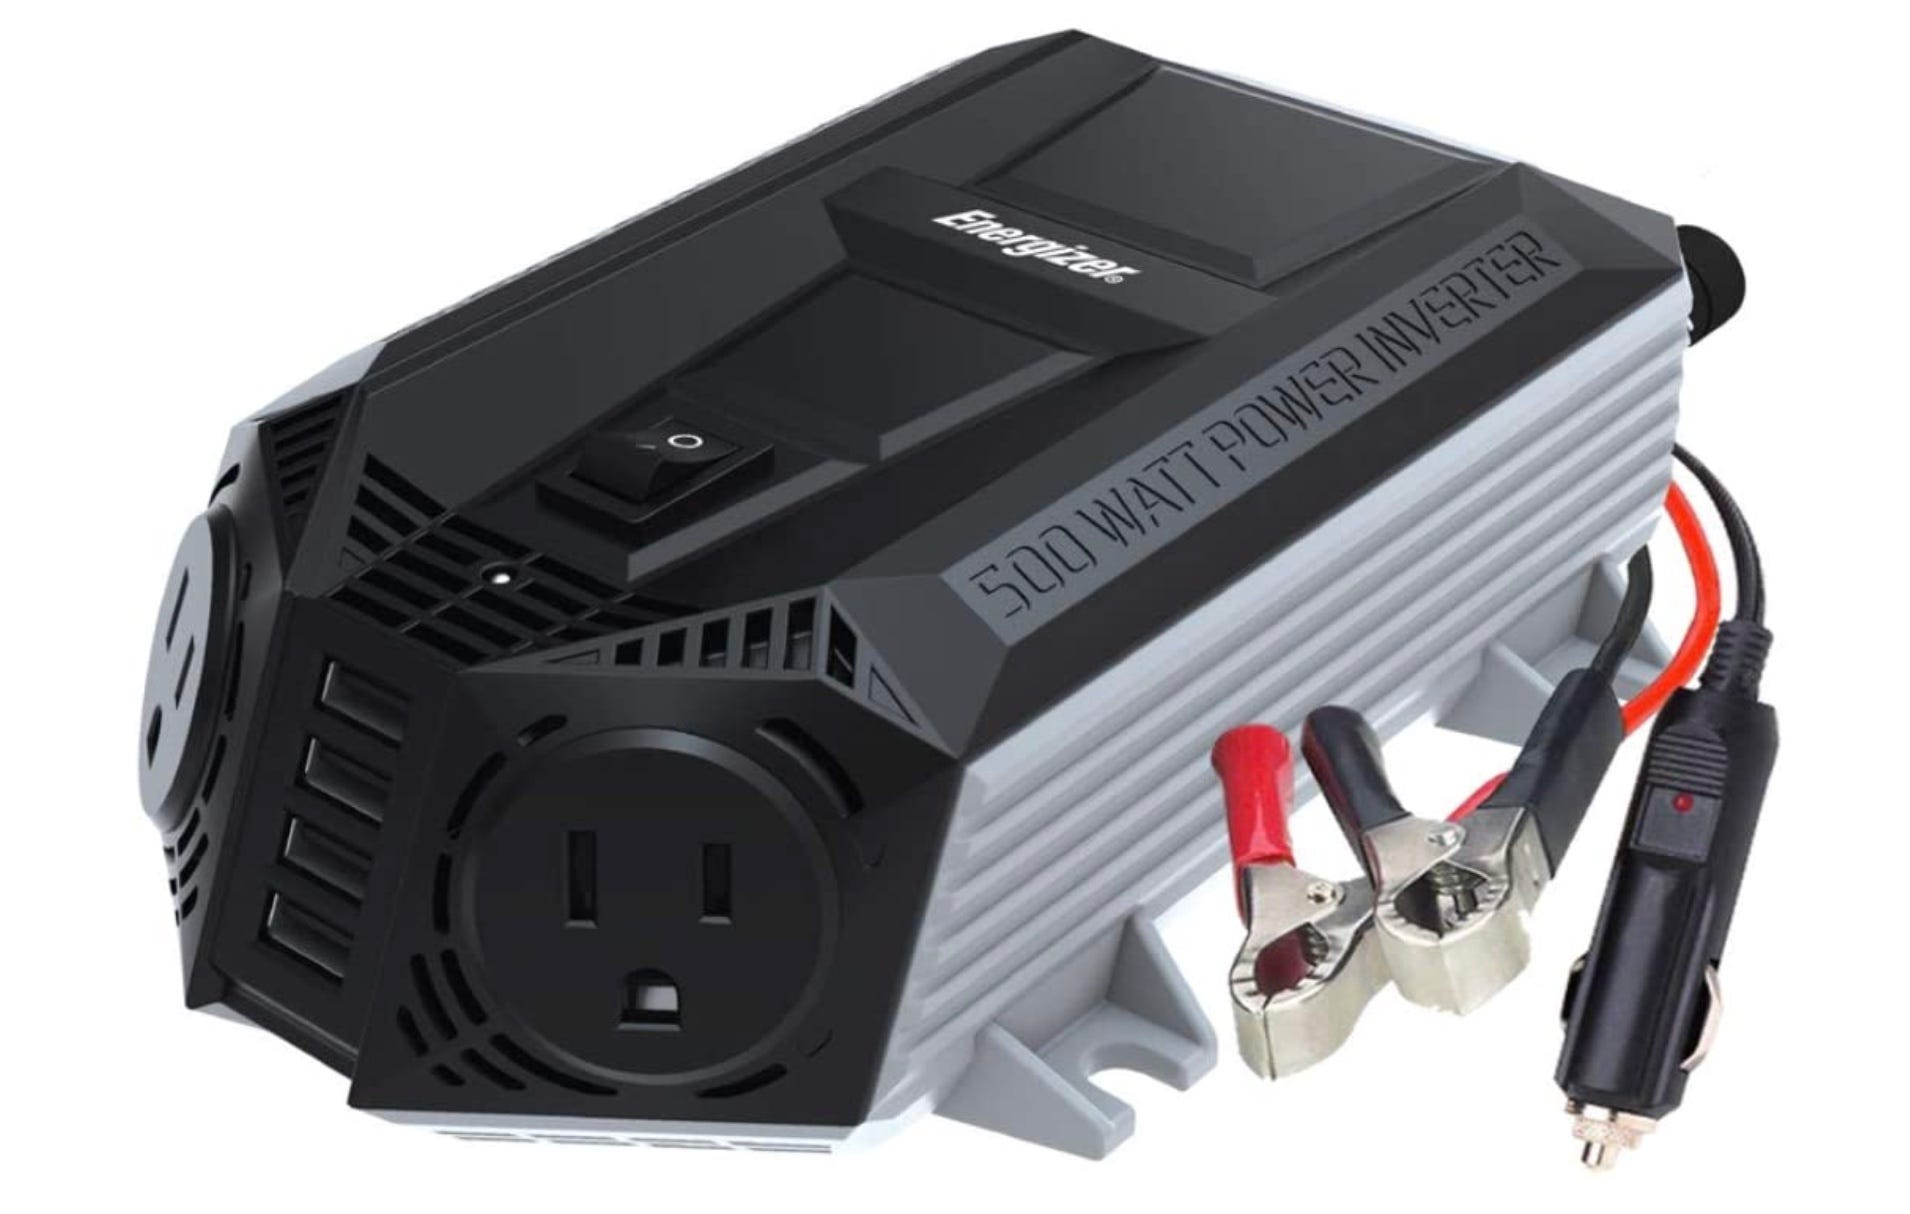 Energizer portable inverter